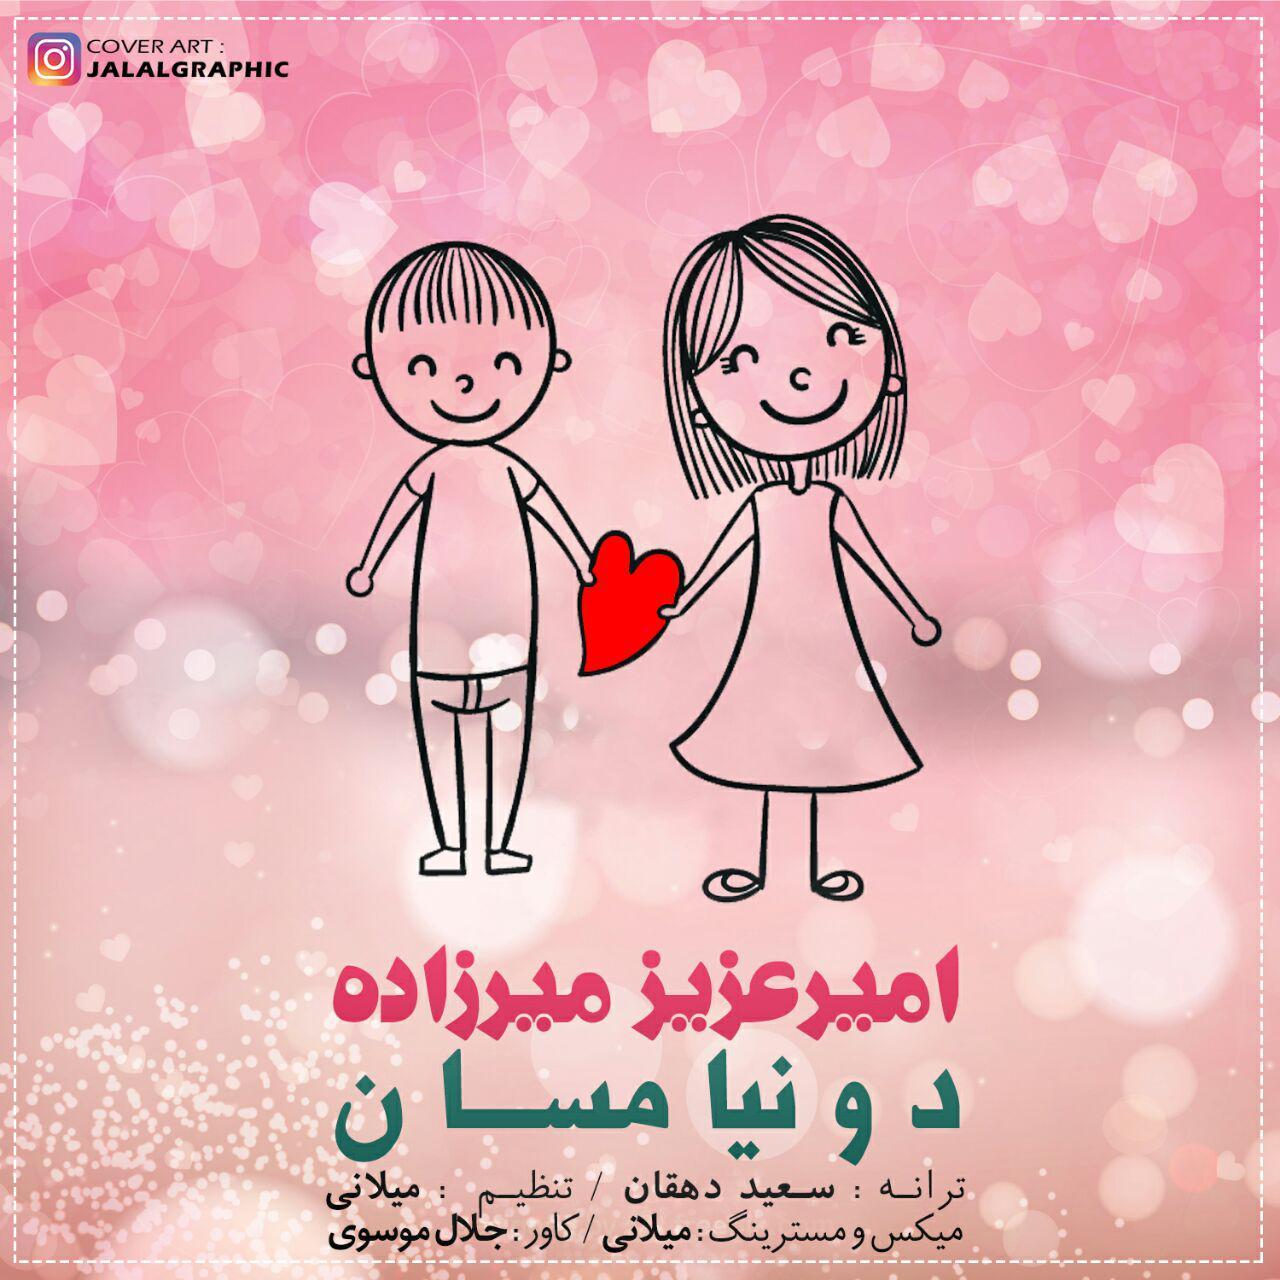 http://s8.picofile.com/file/8293593892/14AmirAziz_Mirzadeh.jpg